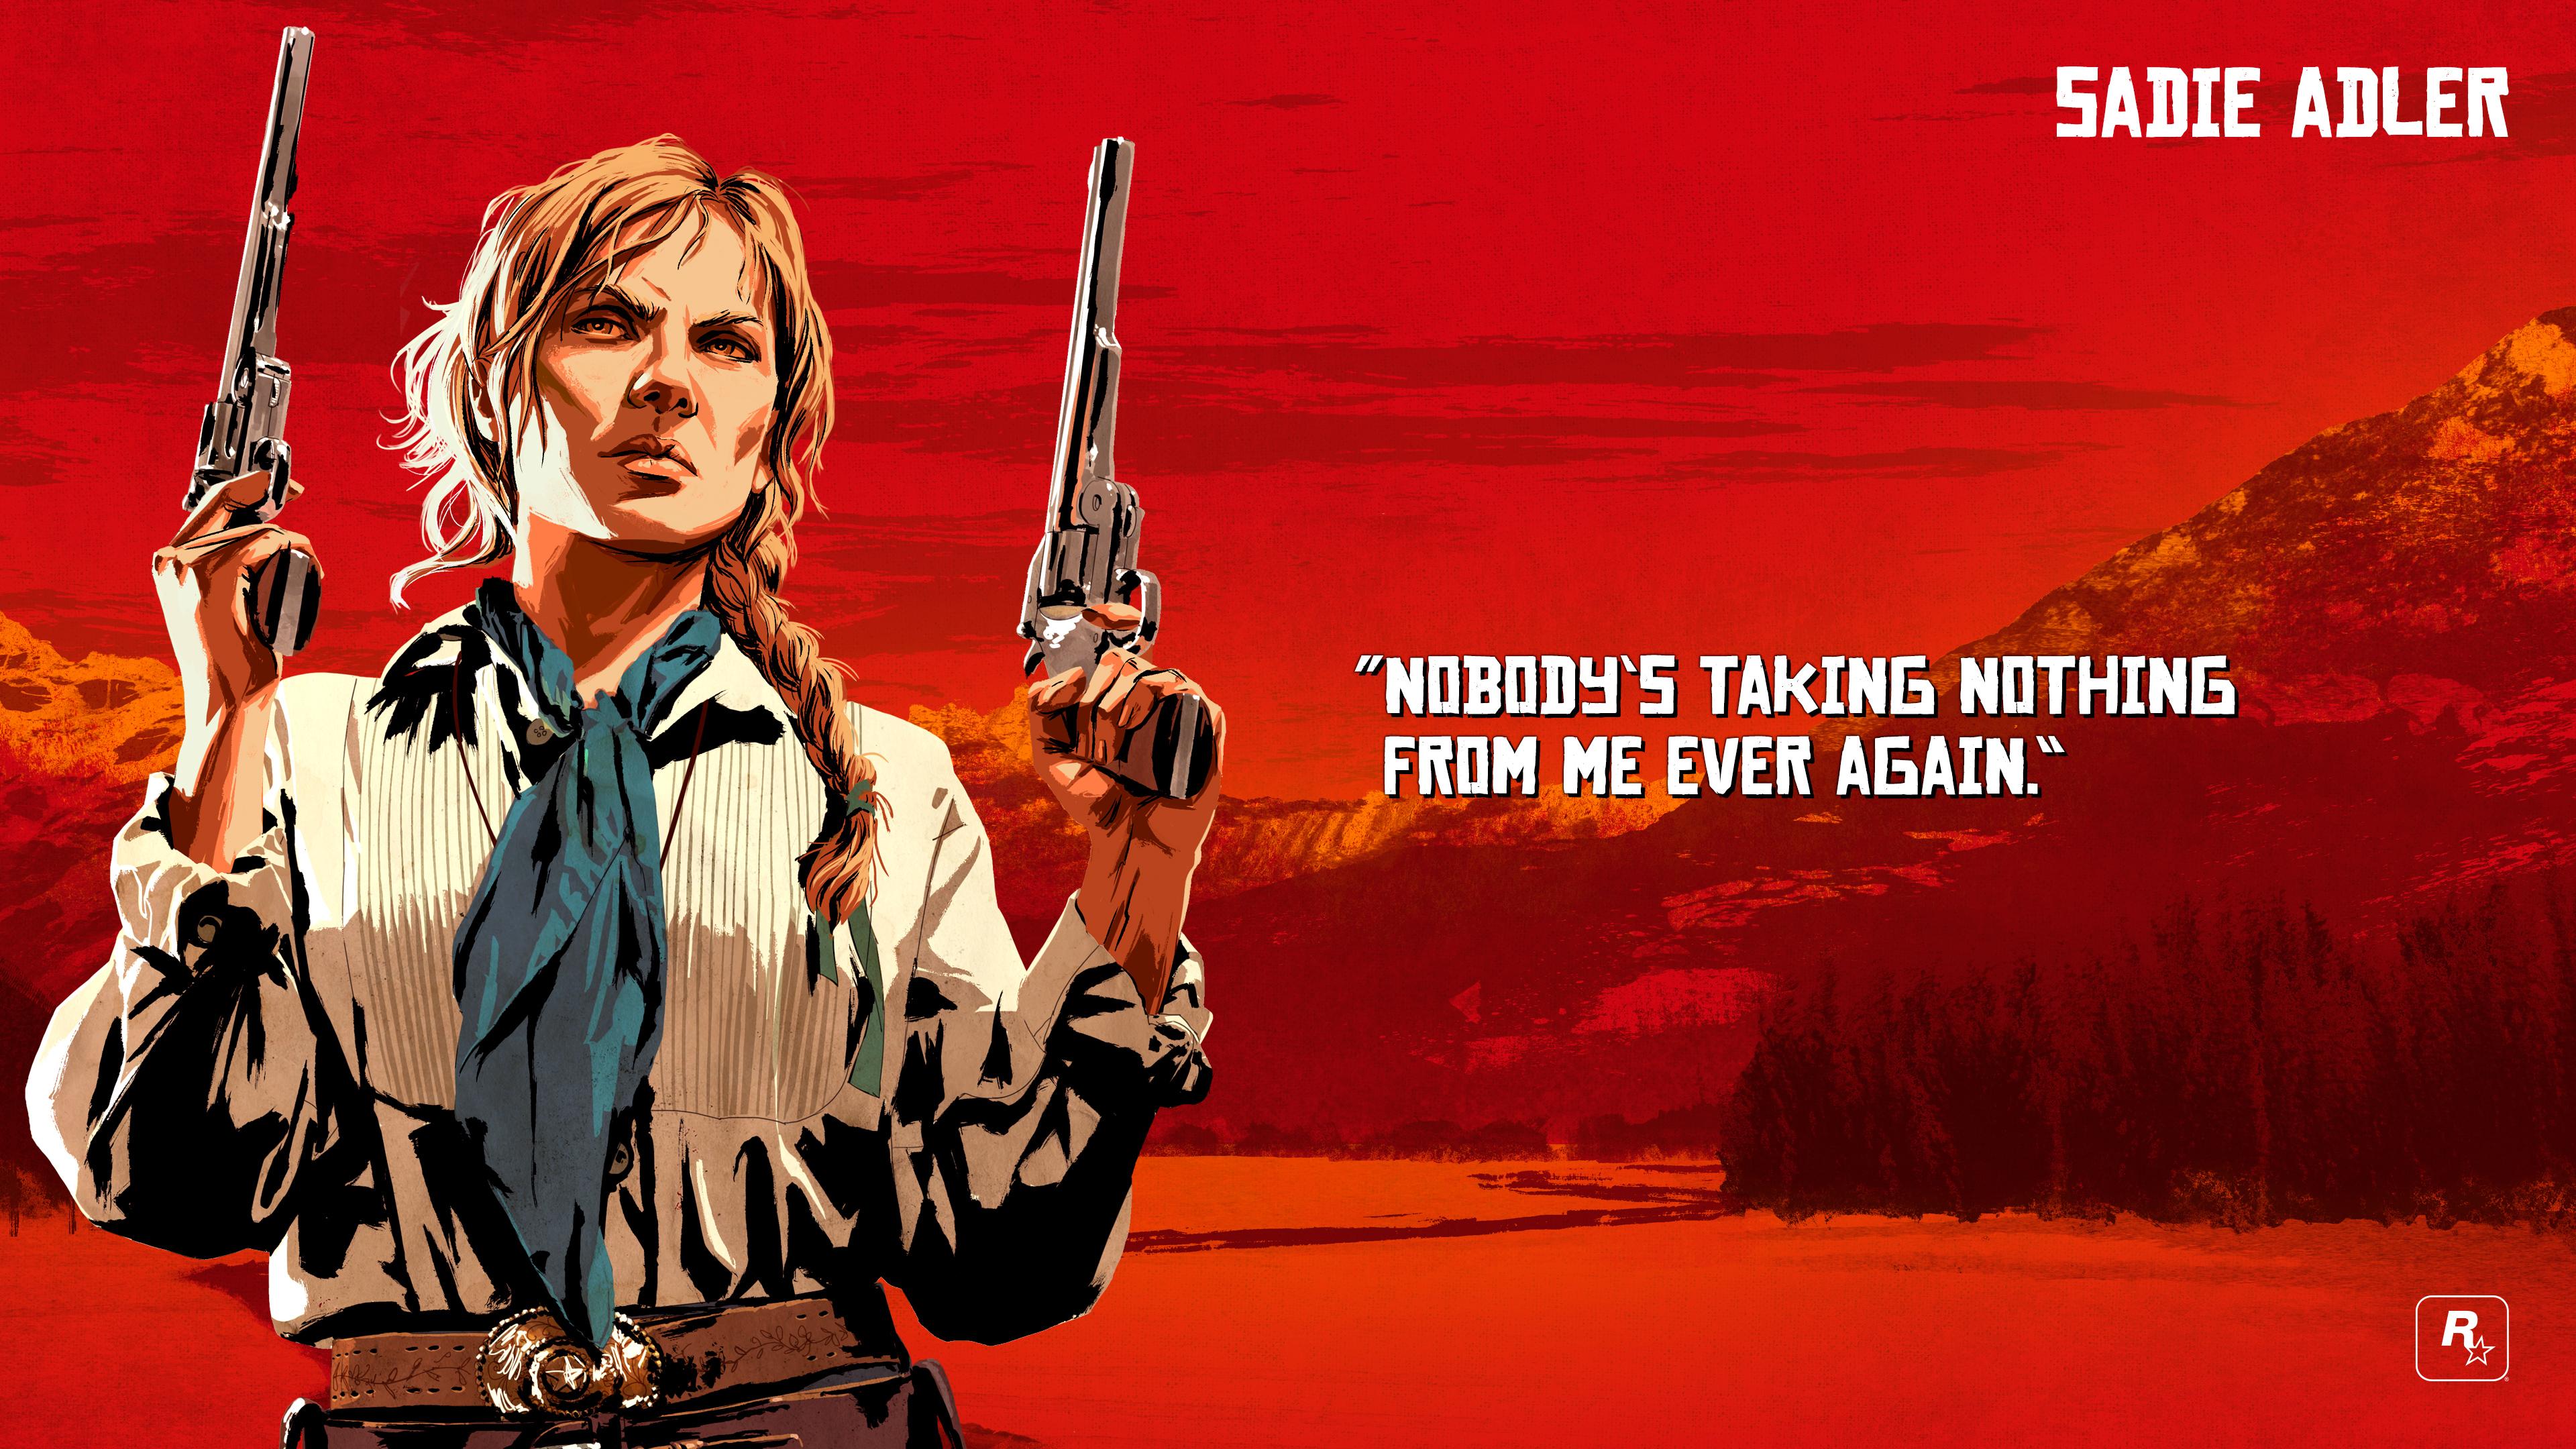 Wallpaper : Red Dead Redemption 2, Rockstar Games, Sadie Adler